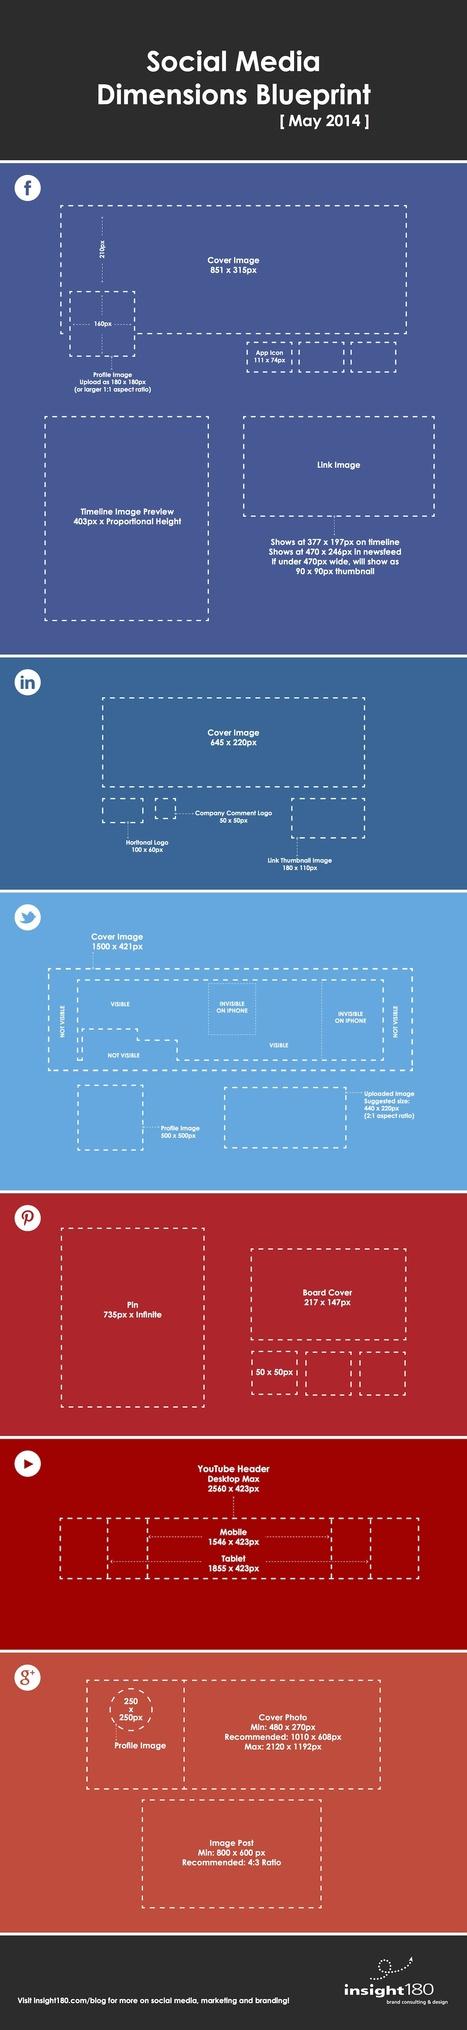 Facebook, LinkedIn, Twitter, Pinterest – Social Media Dimensions Guide [INFOGRAPHIC] | MarketingHits | Scoop.it